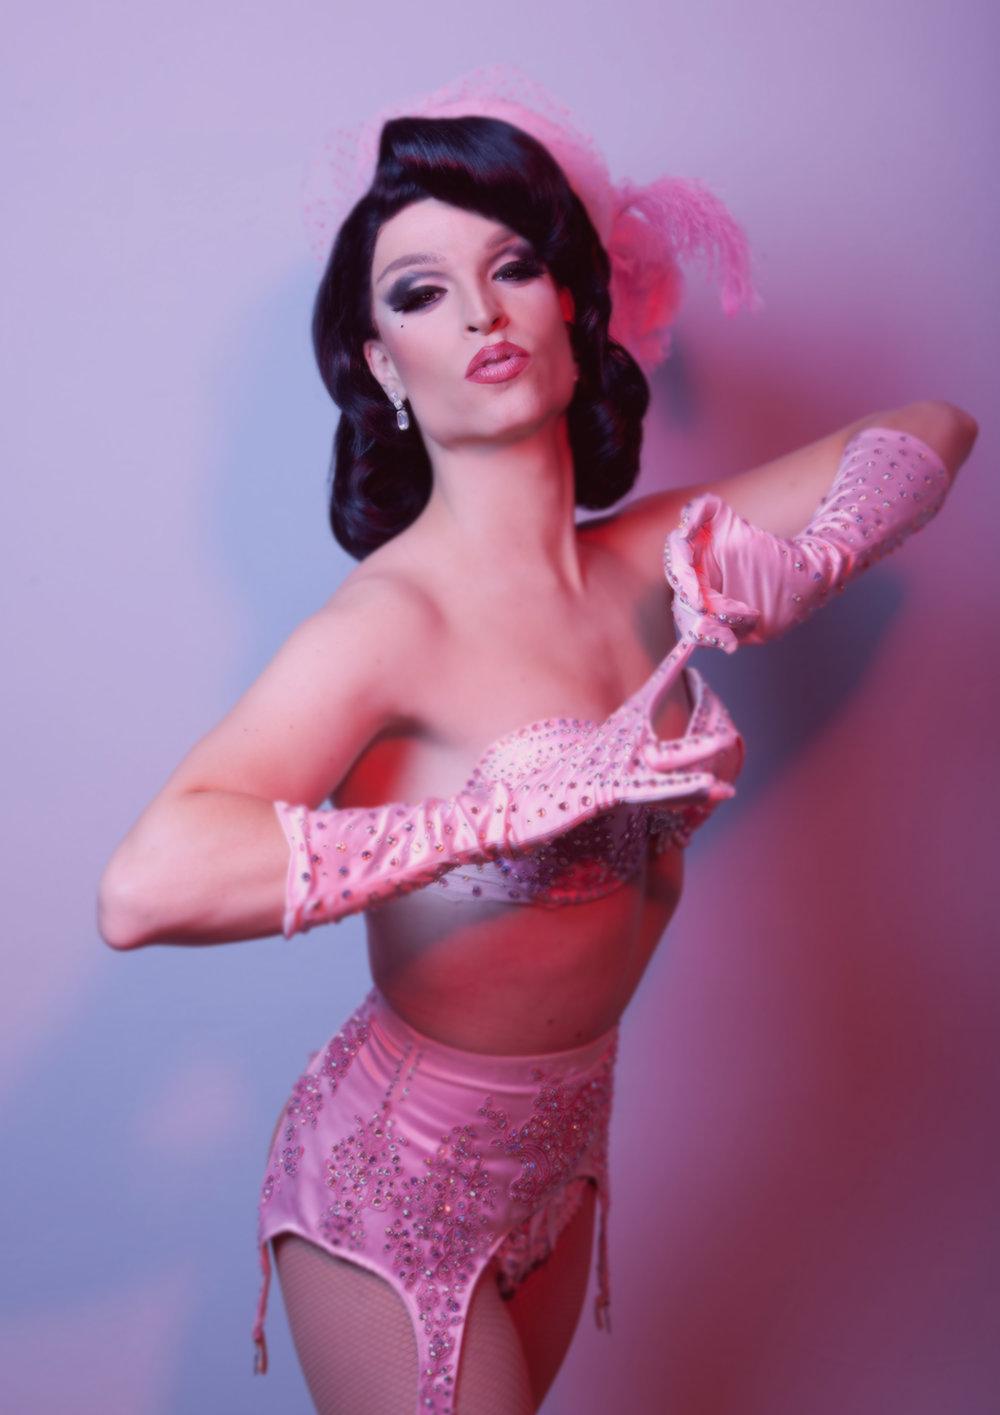 Tamara-Burlesque-Kiss.jpg